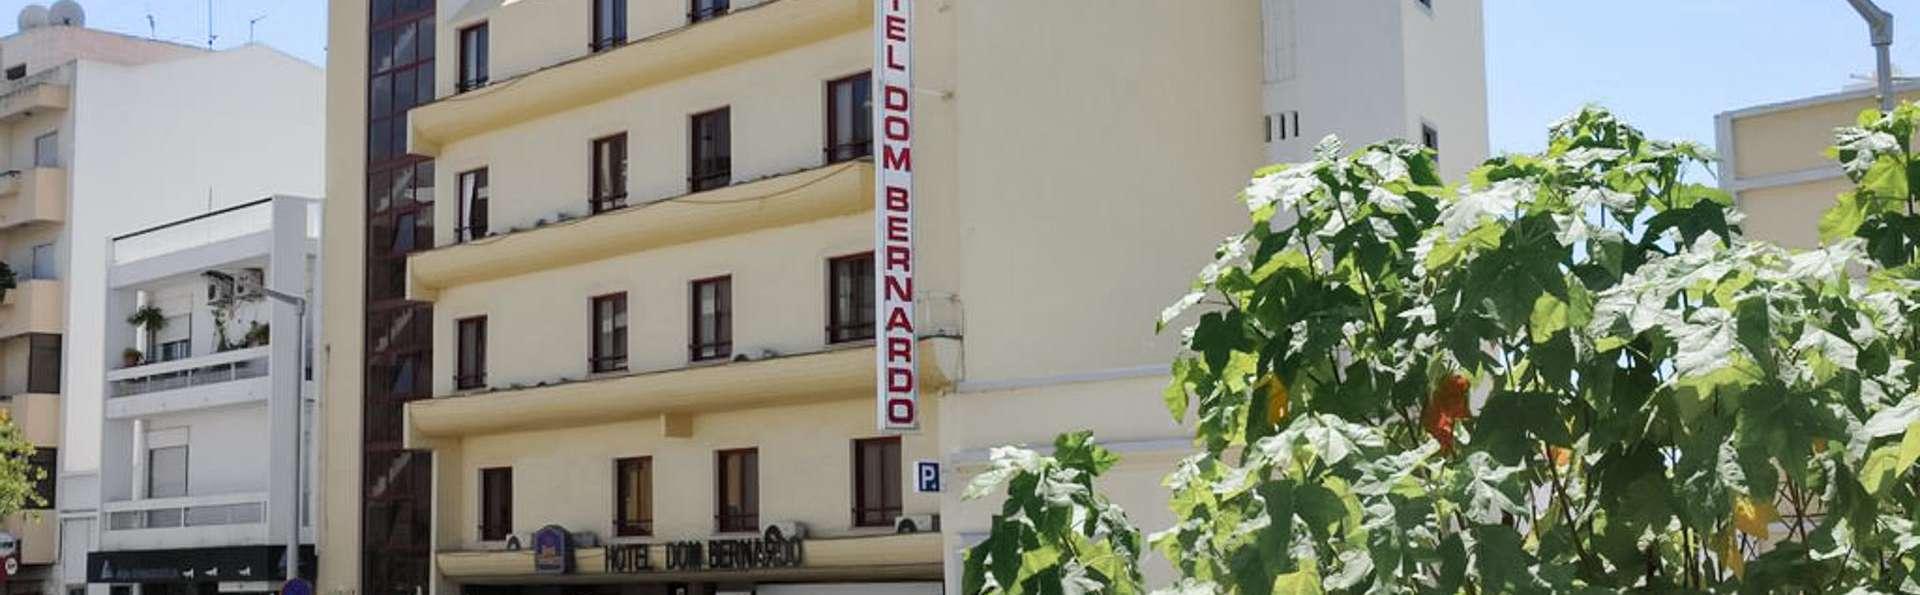 Best Western Hotel Dom Bernardo - EDIT_FRONT_02.jpg